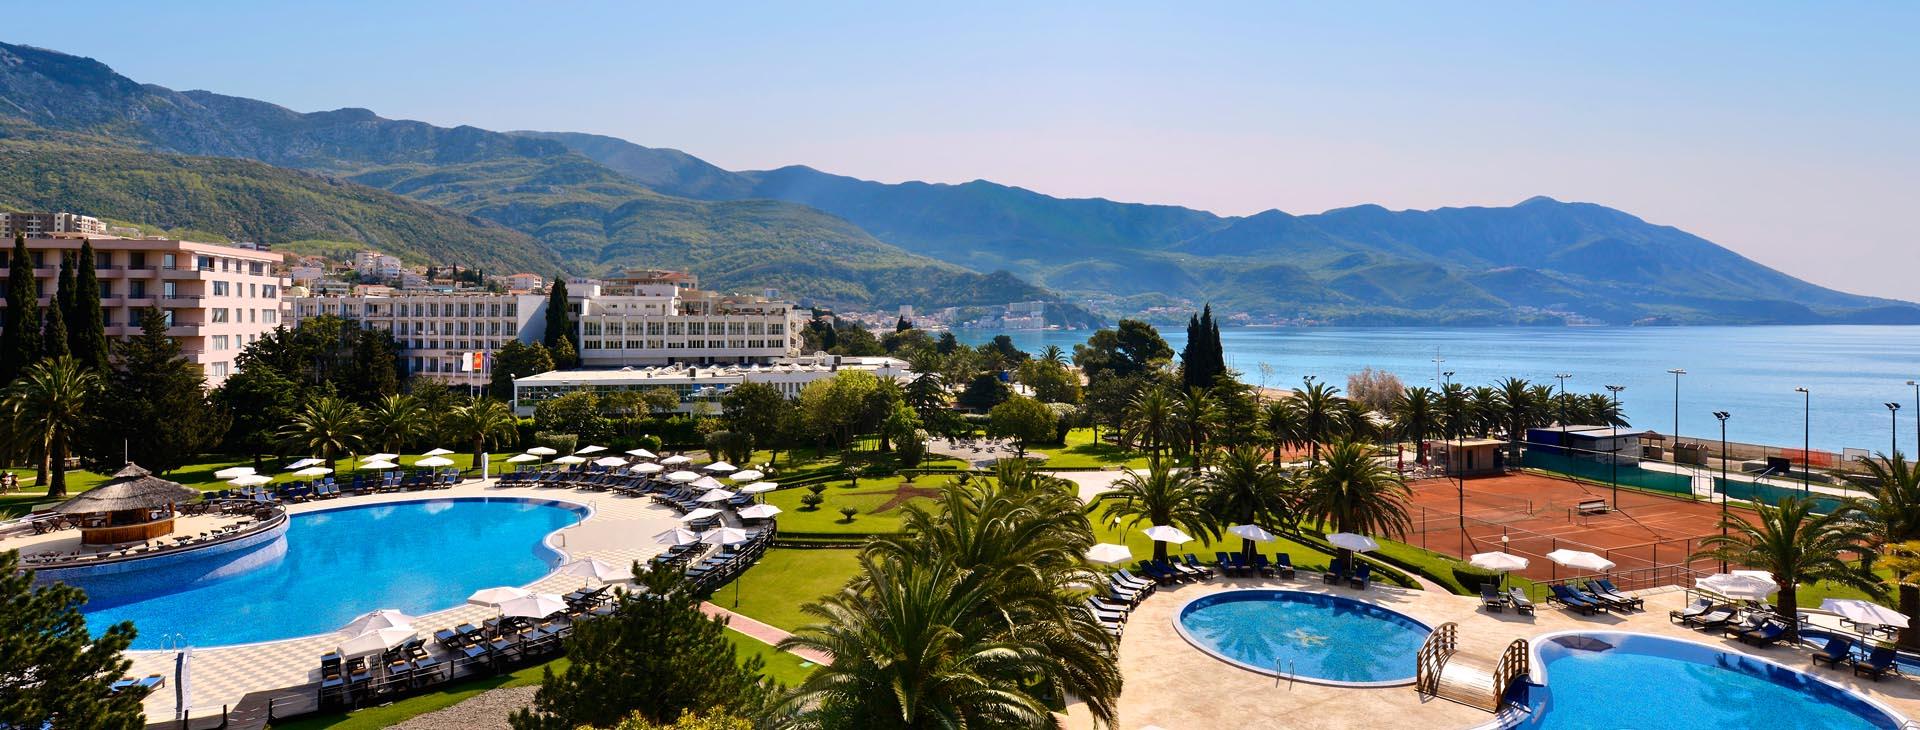 Hotel Iberostar Bellevue All Inclusive